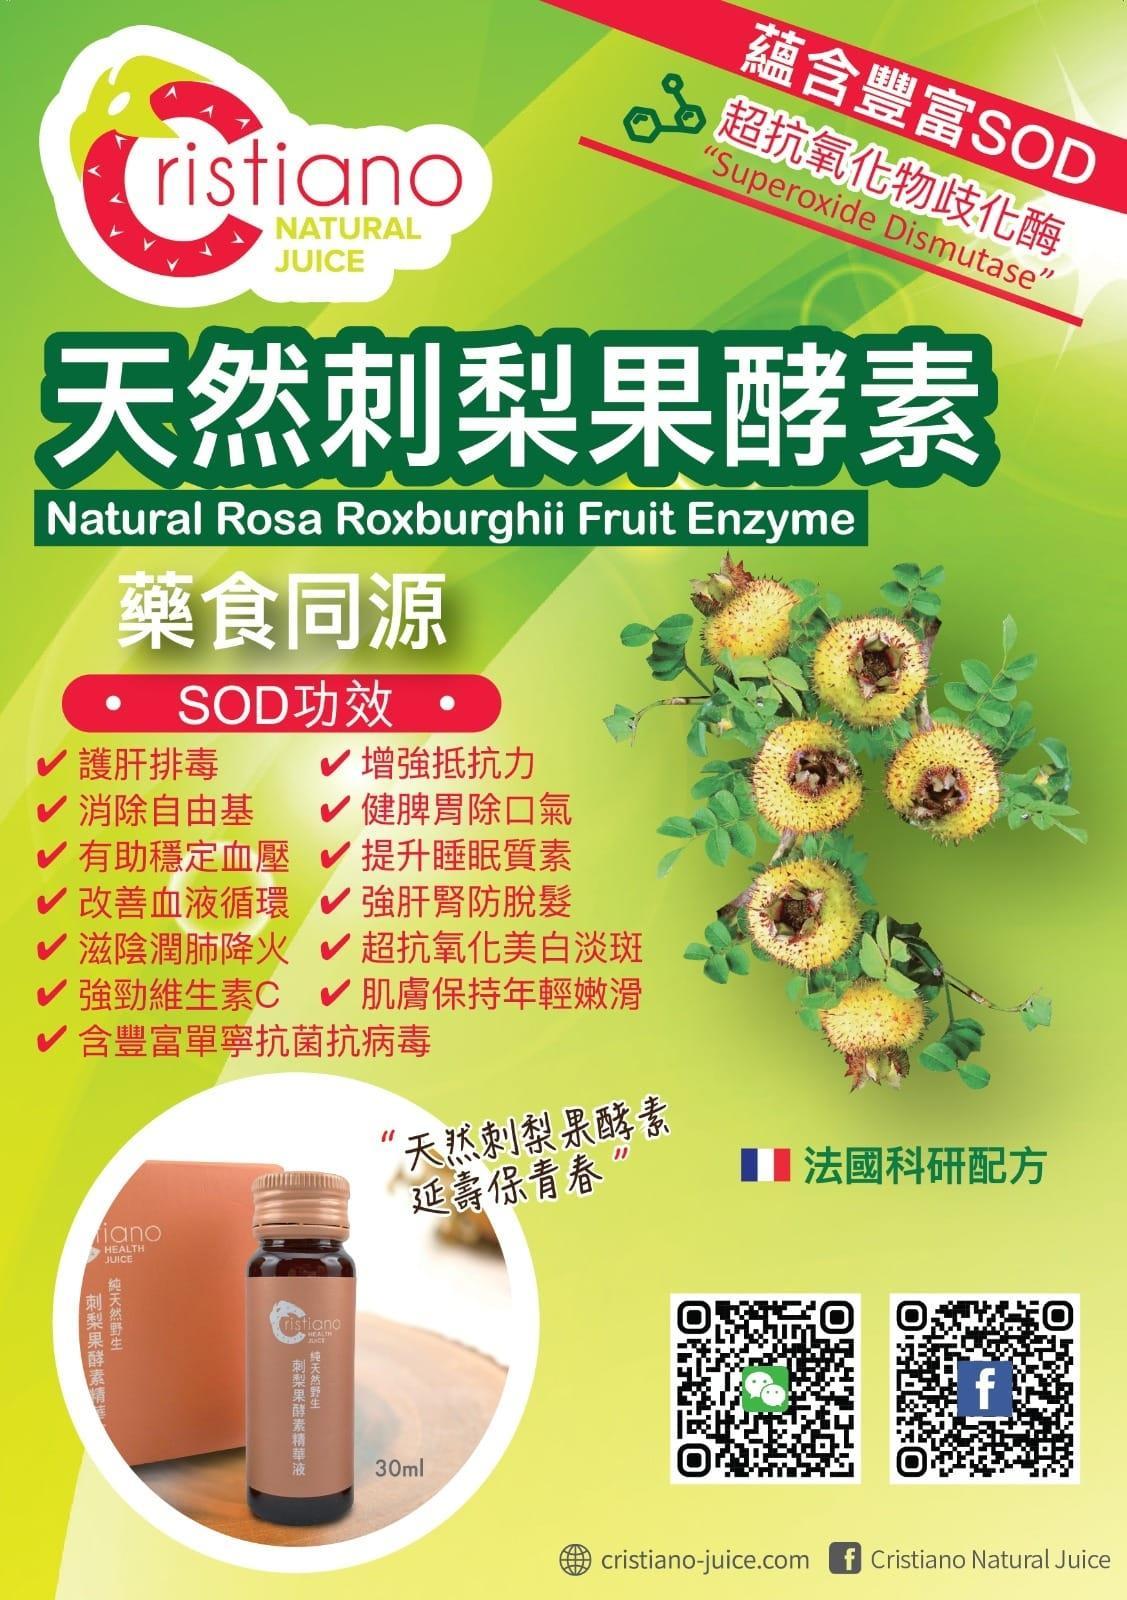 Cristiano Natural Juice 純天然野生刺梨果酵素精華液 350ml